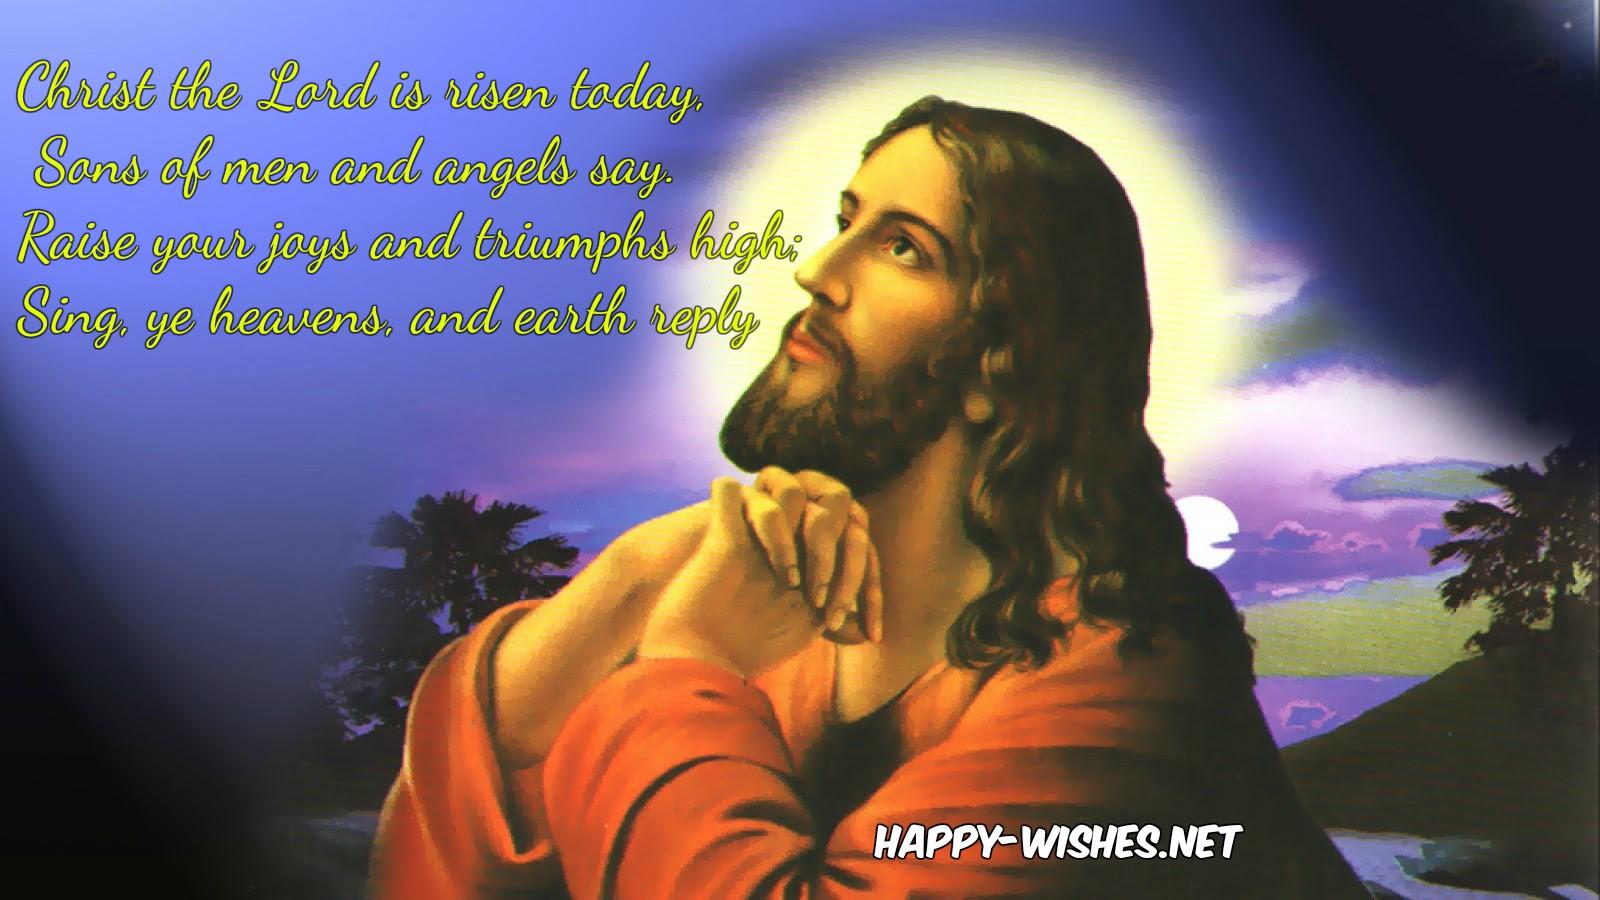 easter-religious-pics-christ